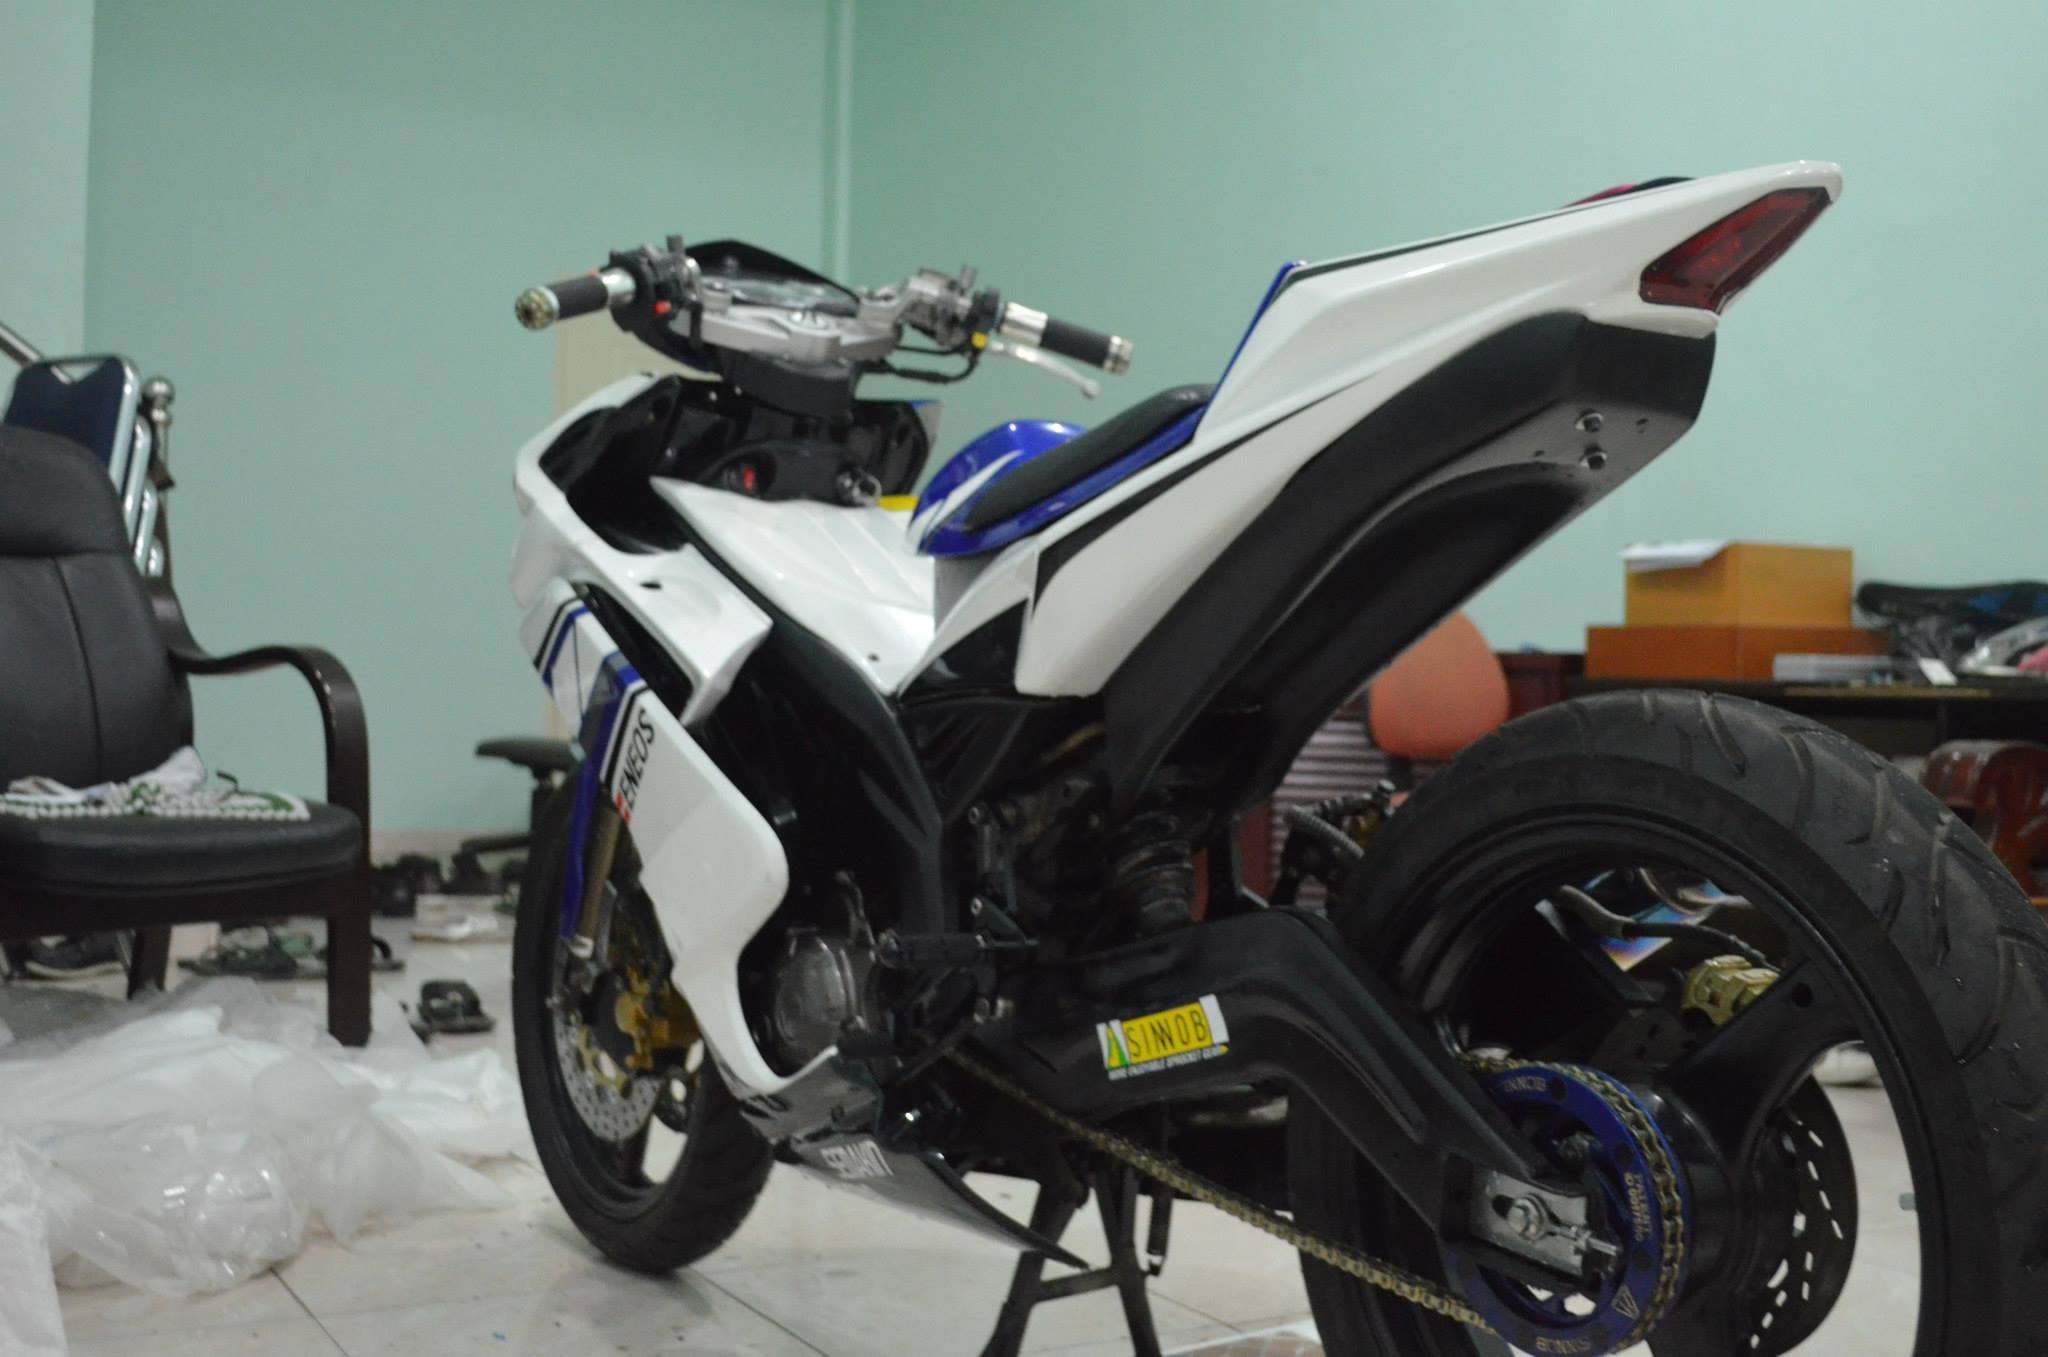 Modifikasi Yamaha Jupiter MX Dual Muffler Keren Abis MOTORBLITZ